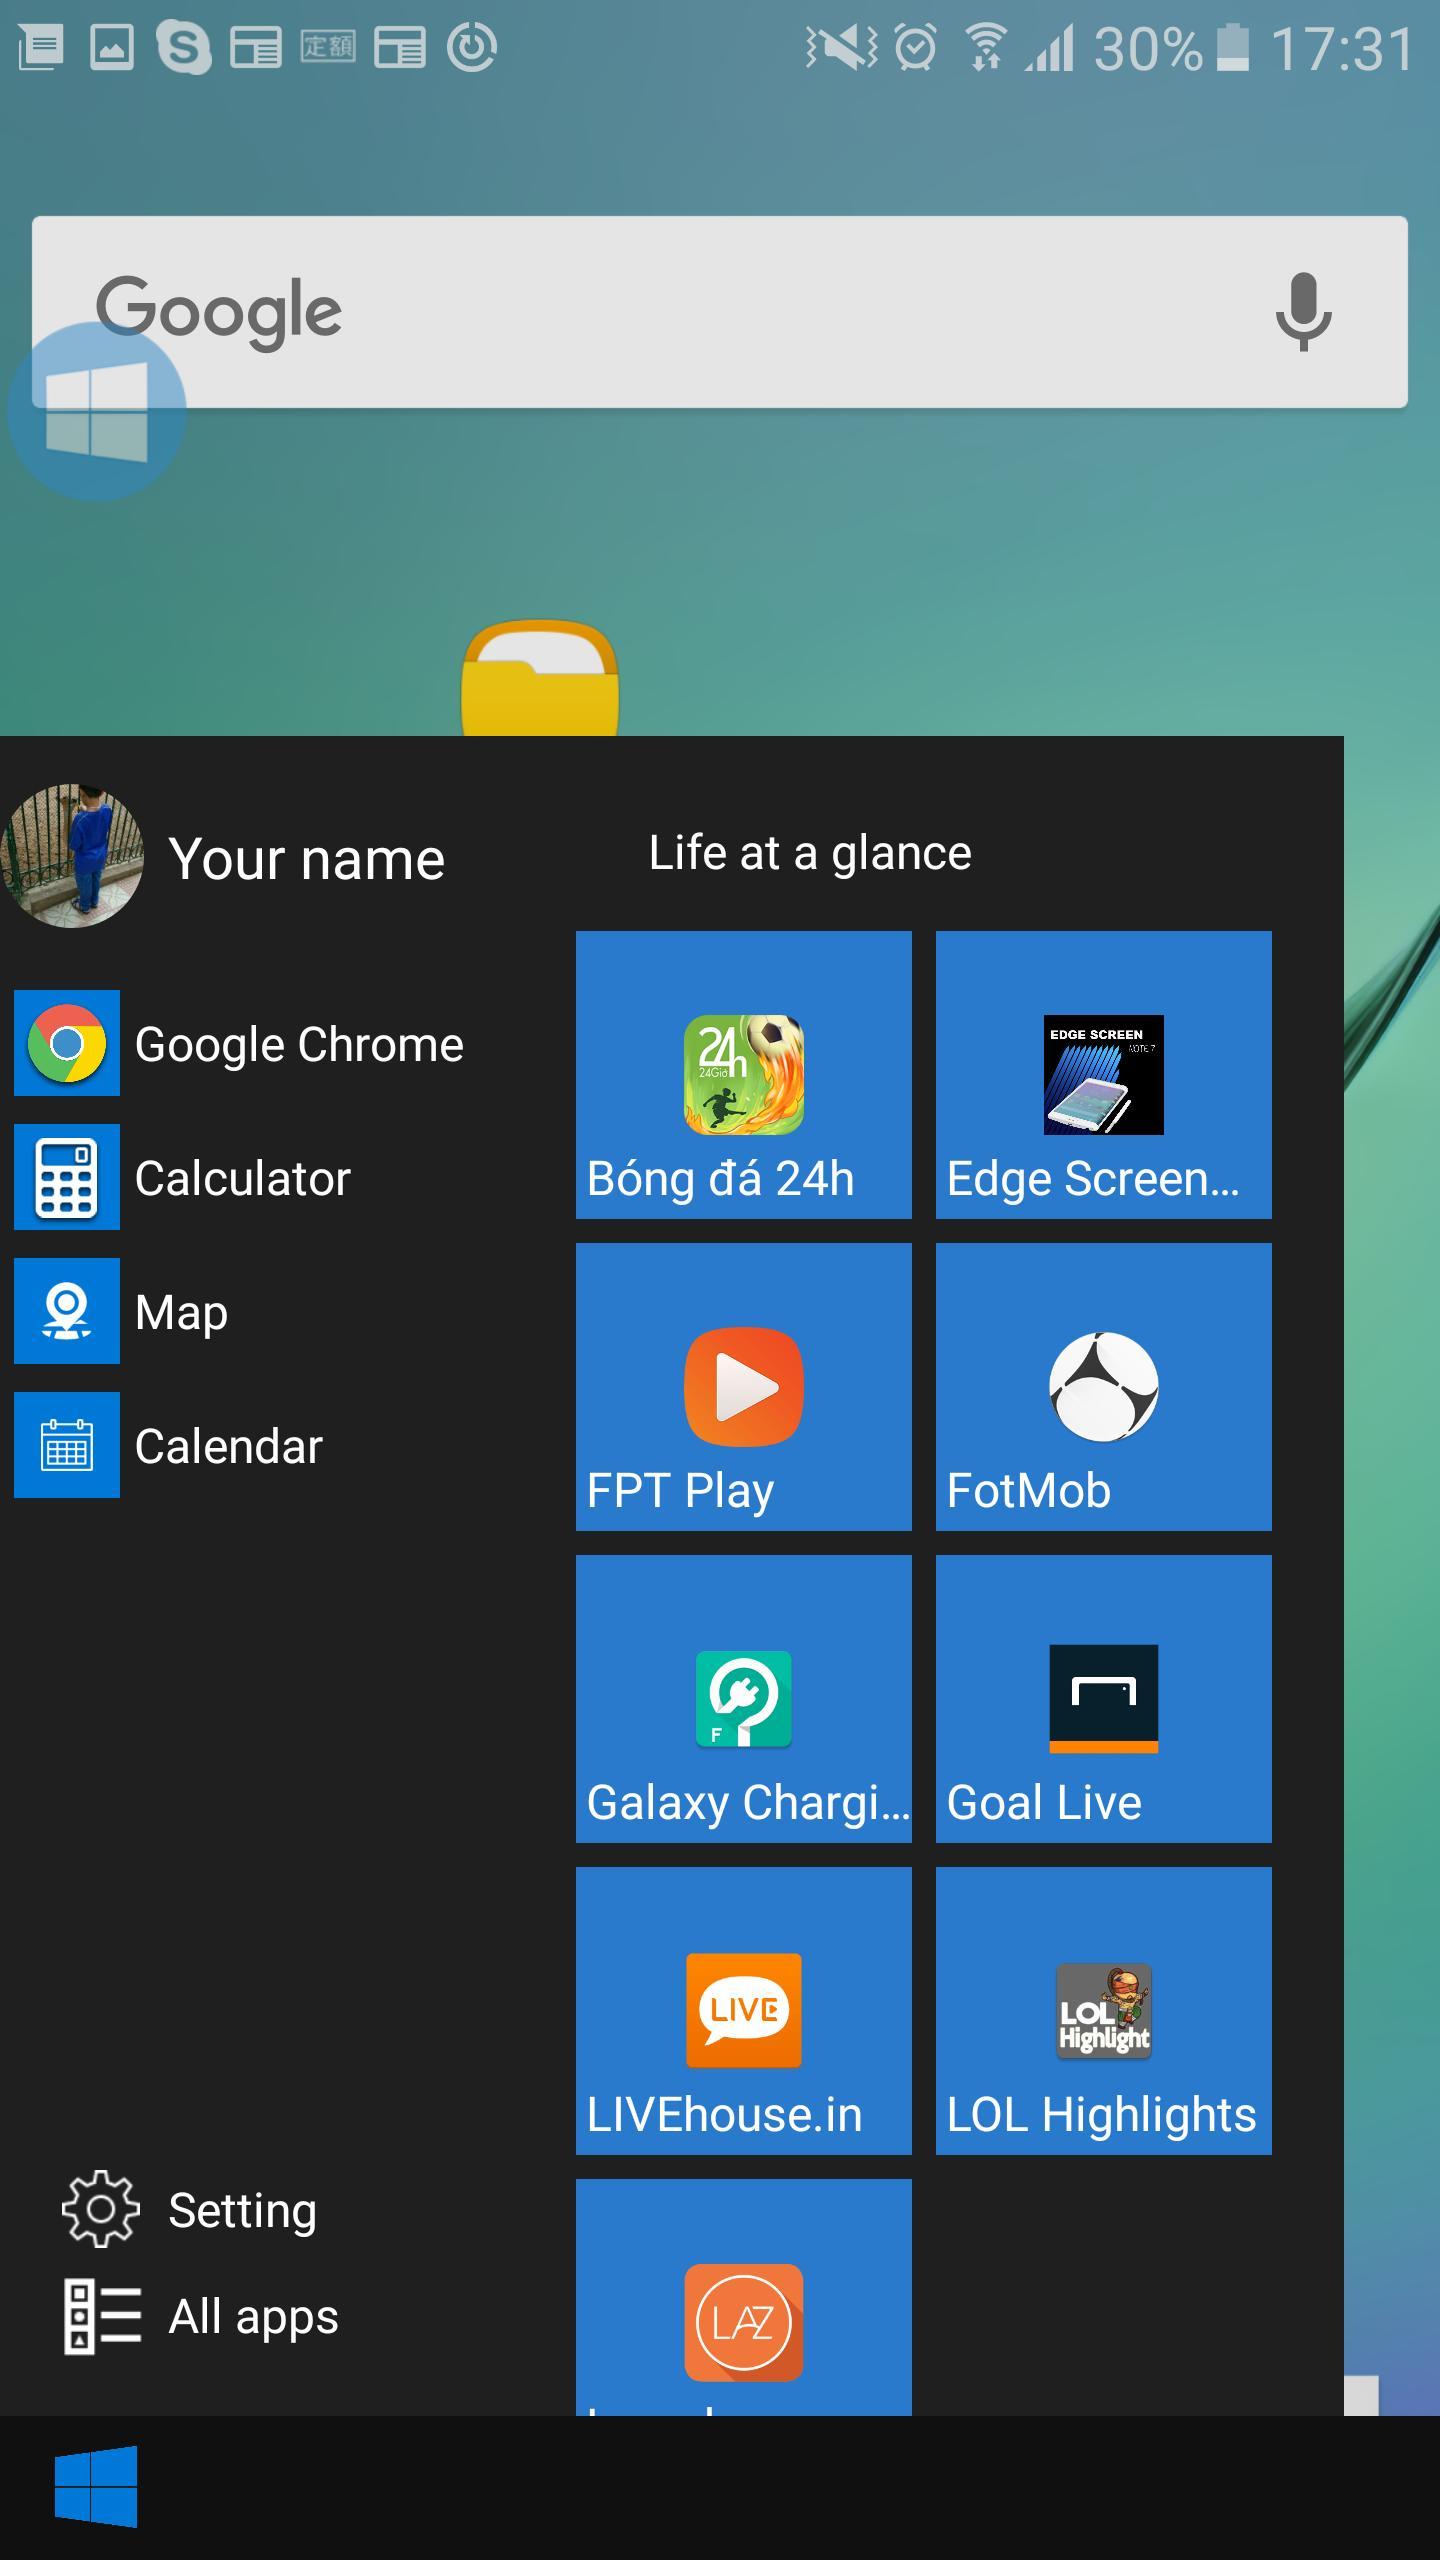 Taskbar Smart Style Windows 10 Для Андроид  Скачать Apk for Add Google Calendar To Taskbar Windows 10